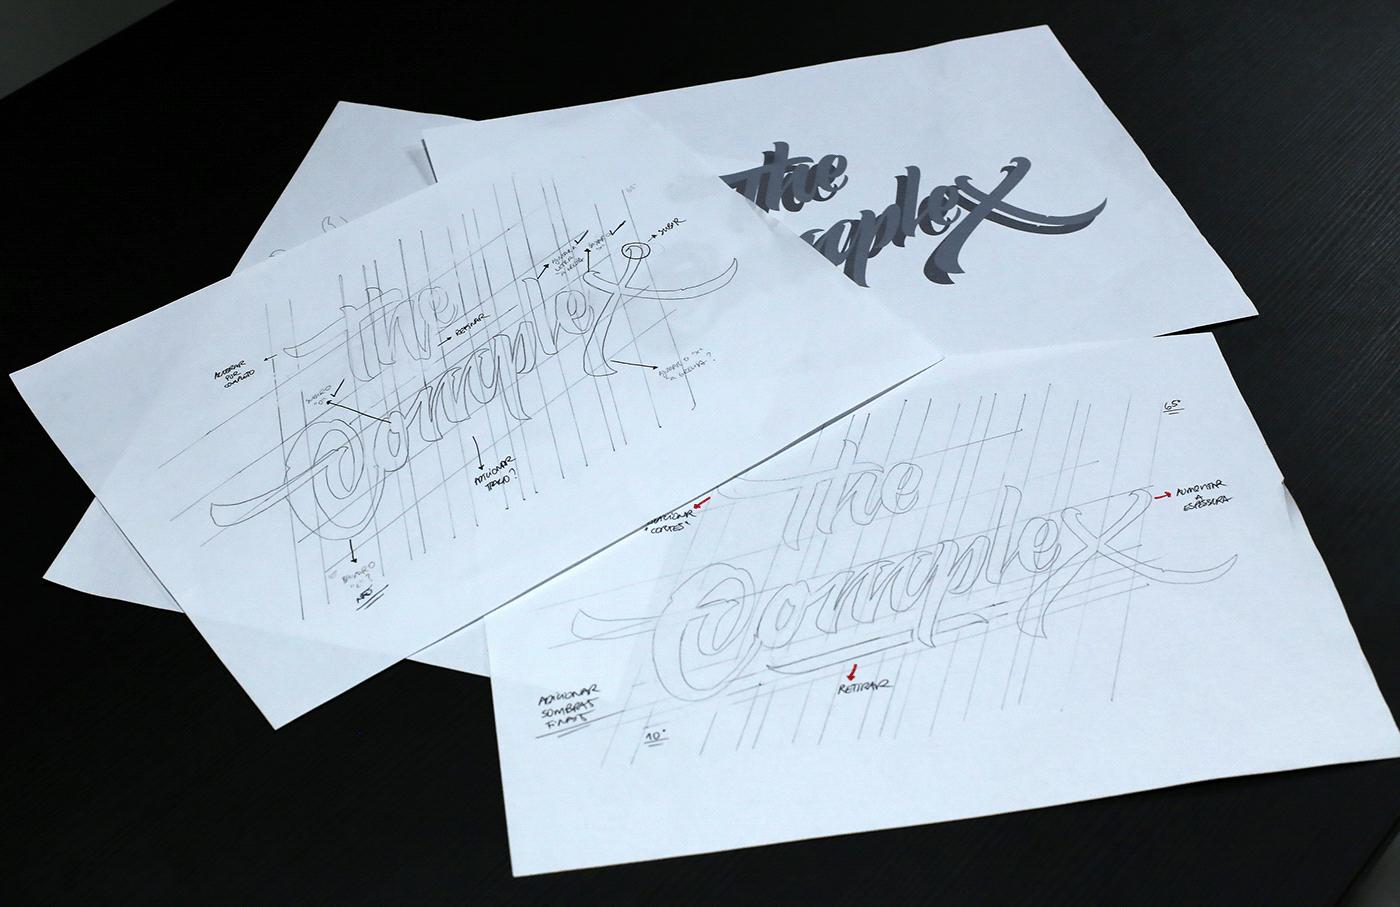 Image may contain: handwriting, drawing and envelope